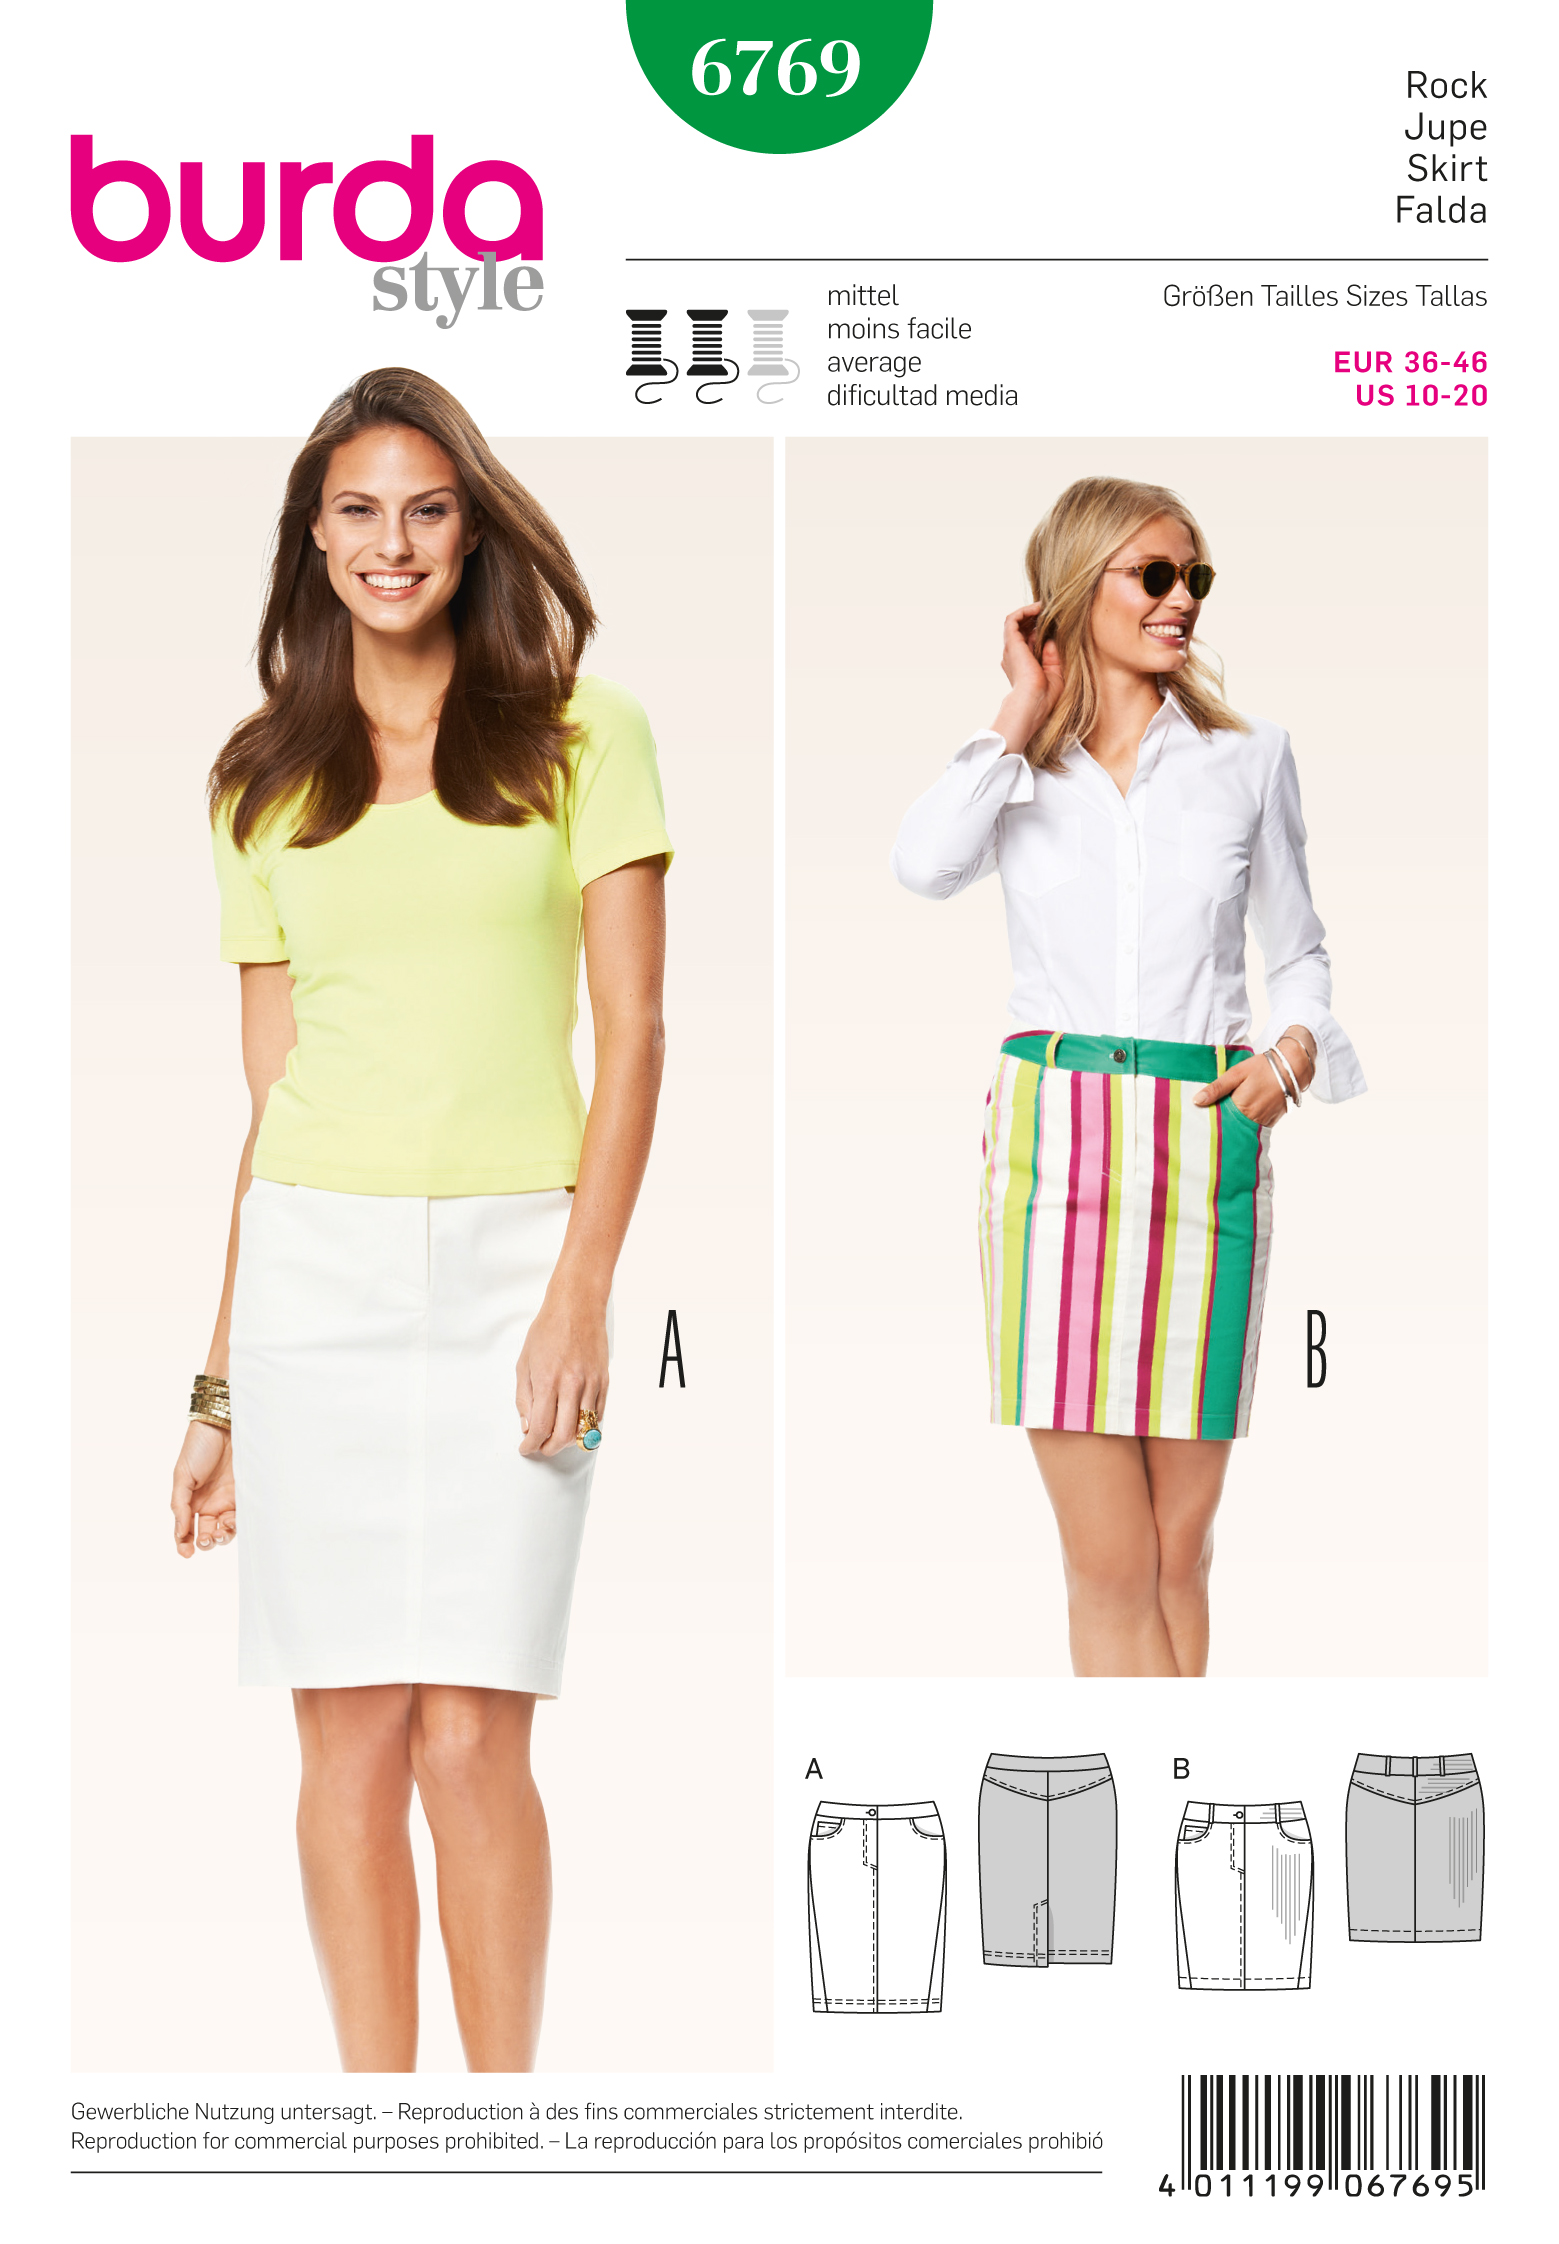 Burda 6769 Burda Style Skirts sewing pattern